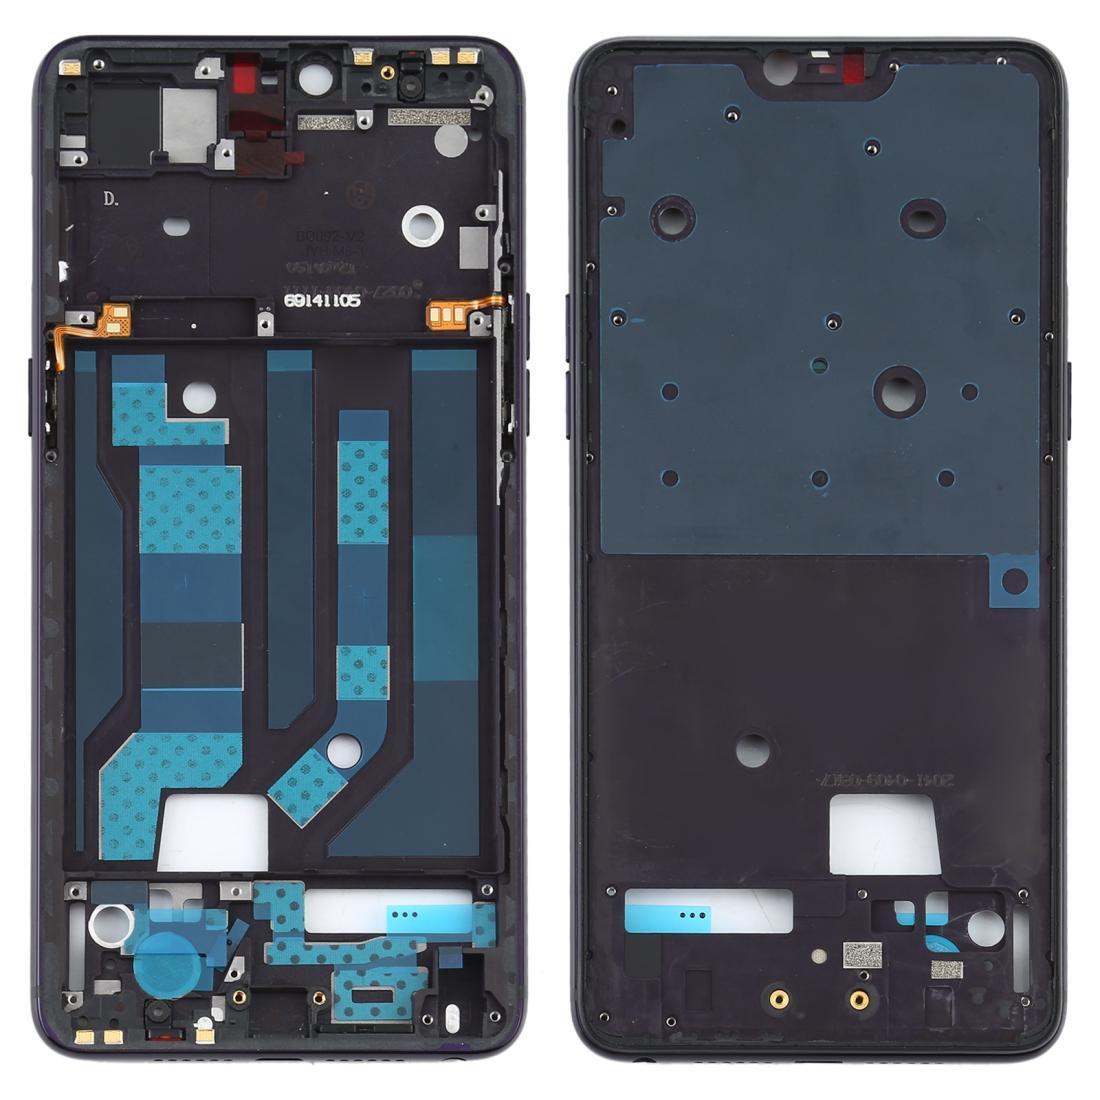 Frontgehäuse LCD-Rahmen-Blende-Platte für Oppo R15 PR5 PACM00 CPH1835 PACT00 CPH1831 PAAM00